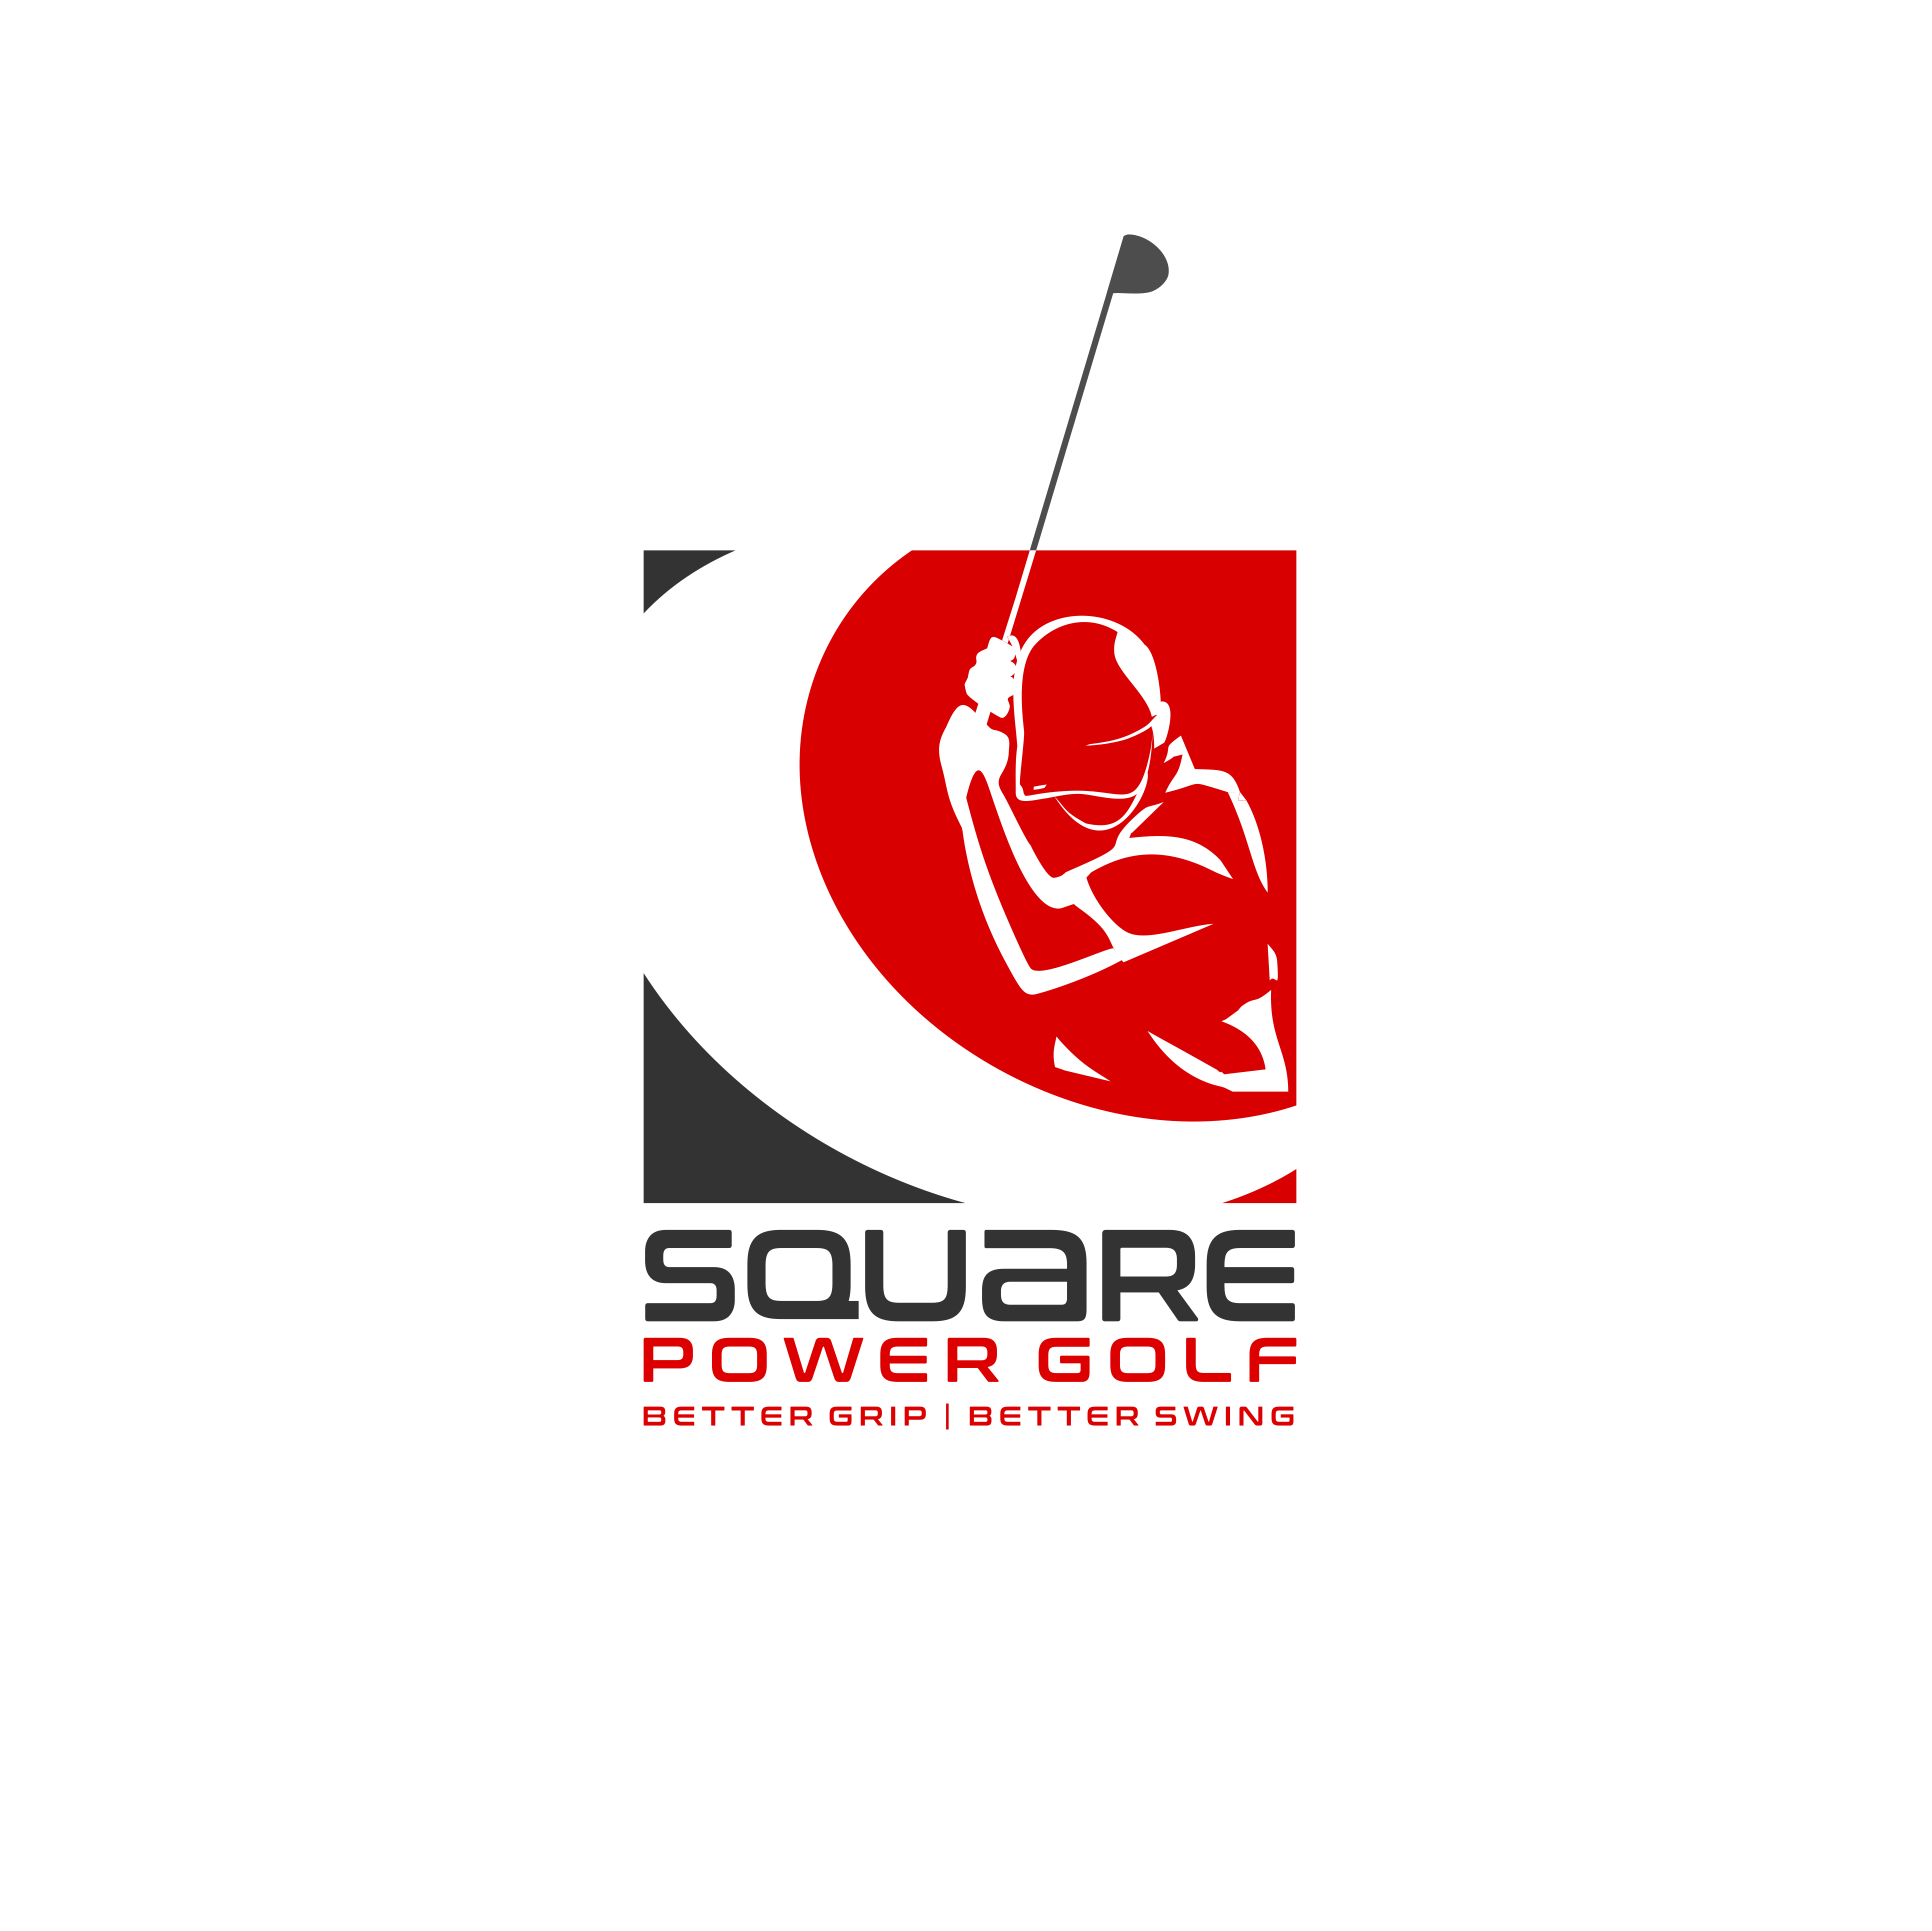 Square Power Golf